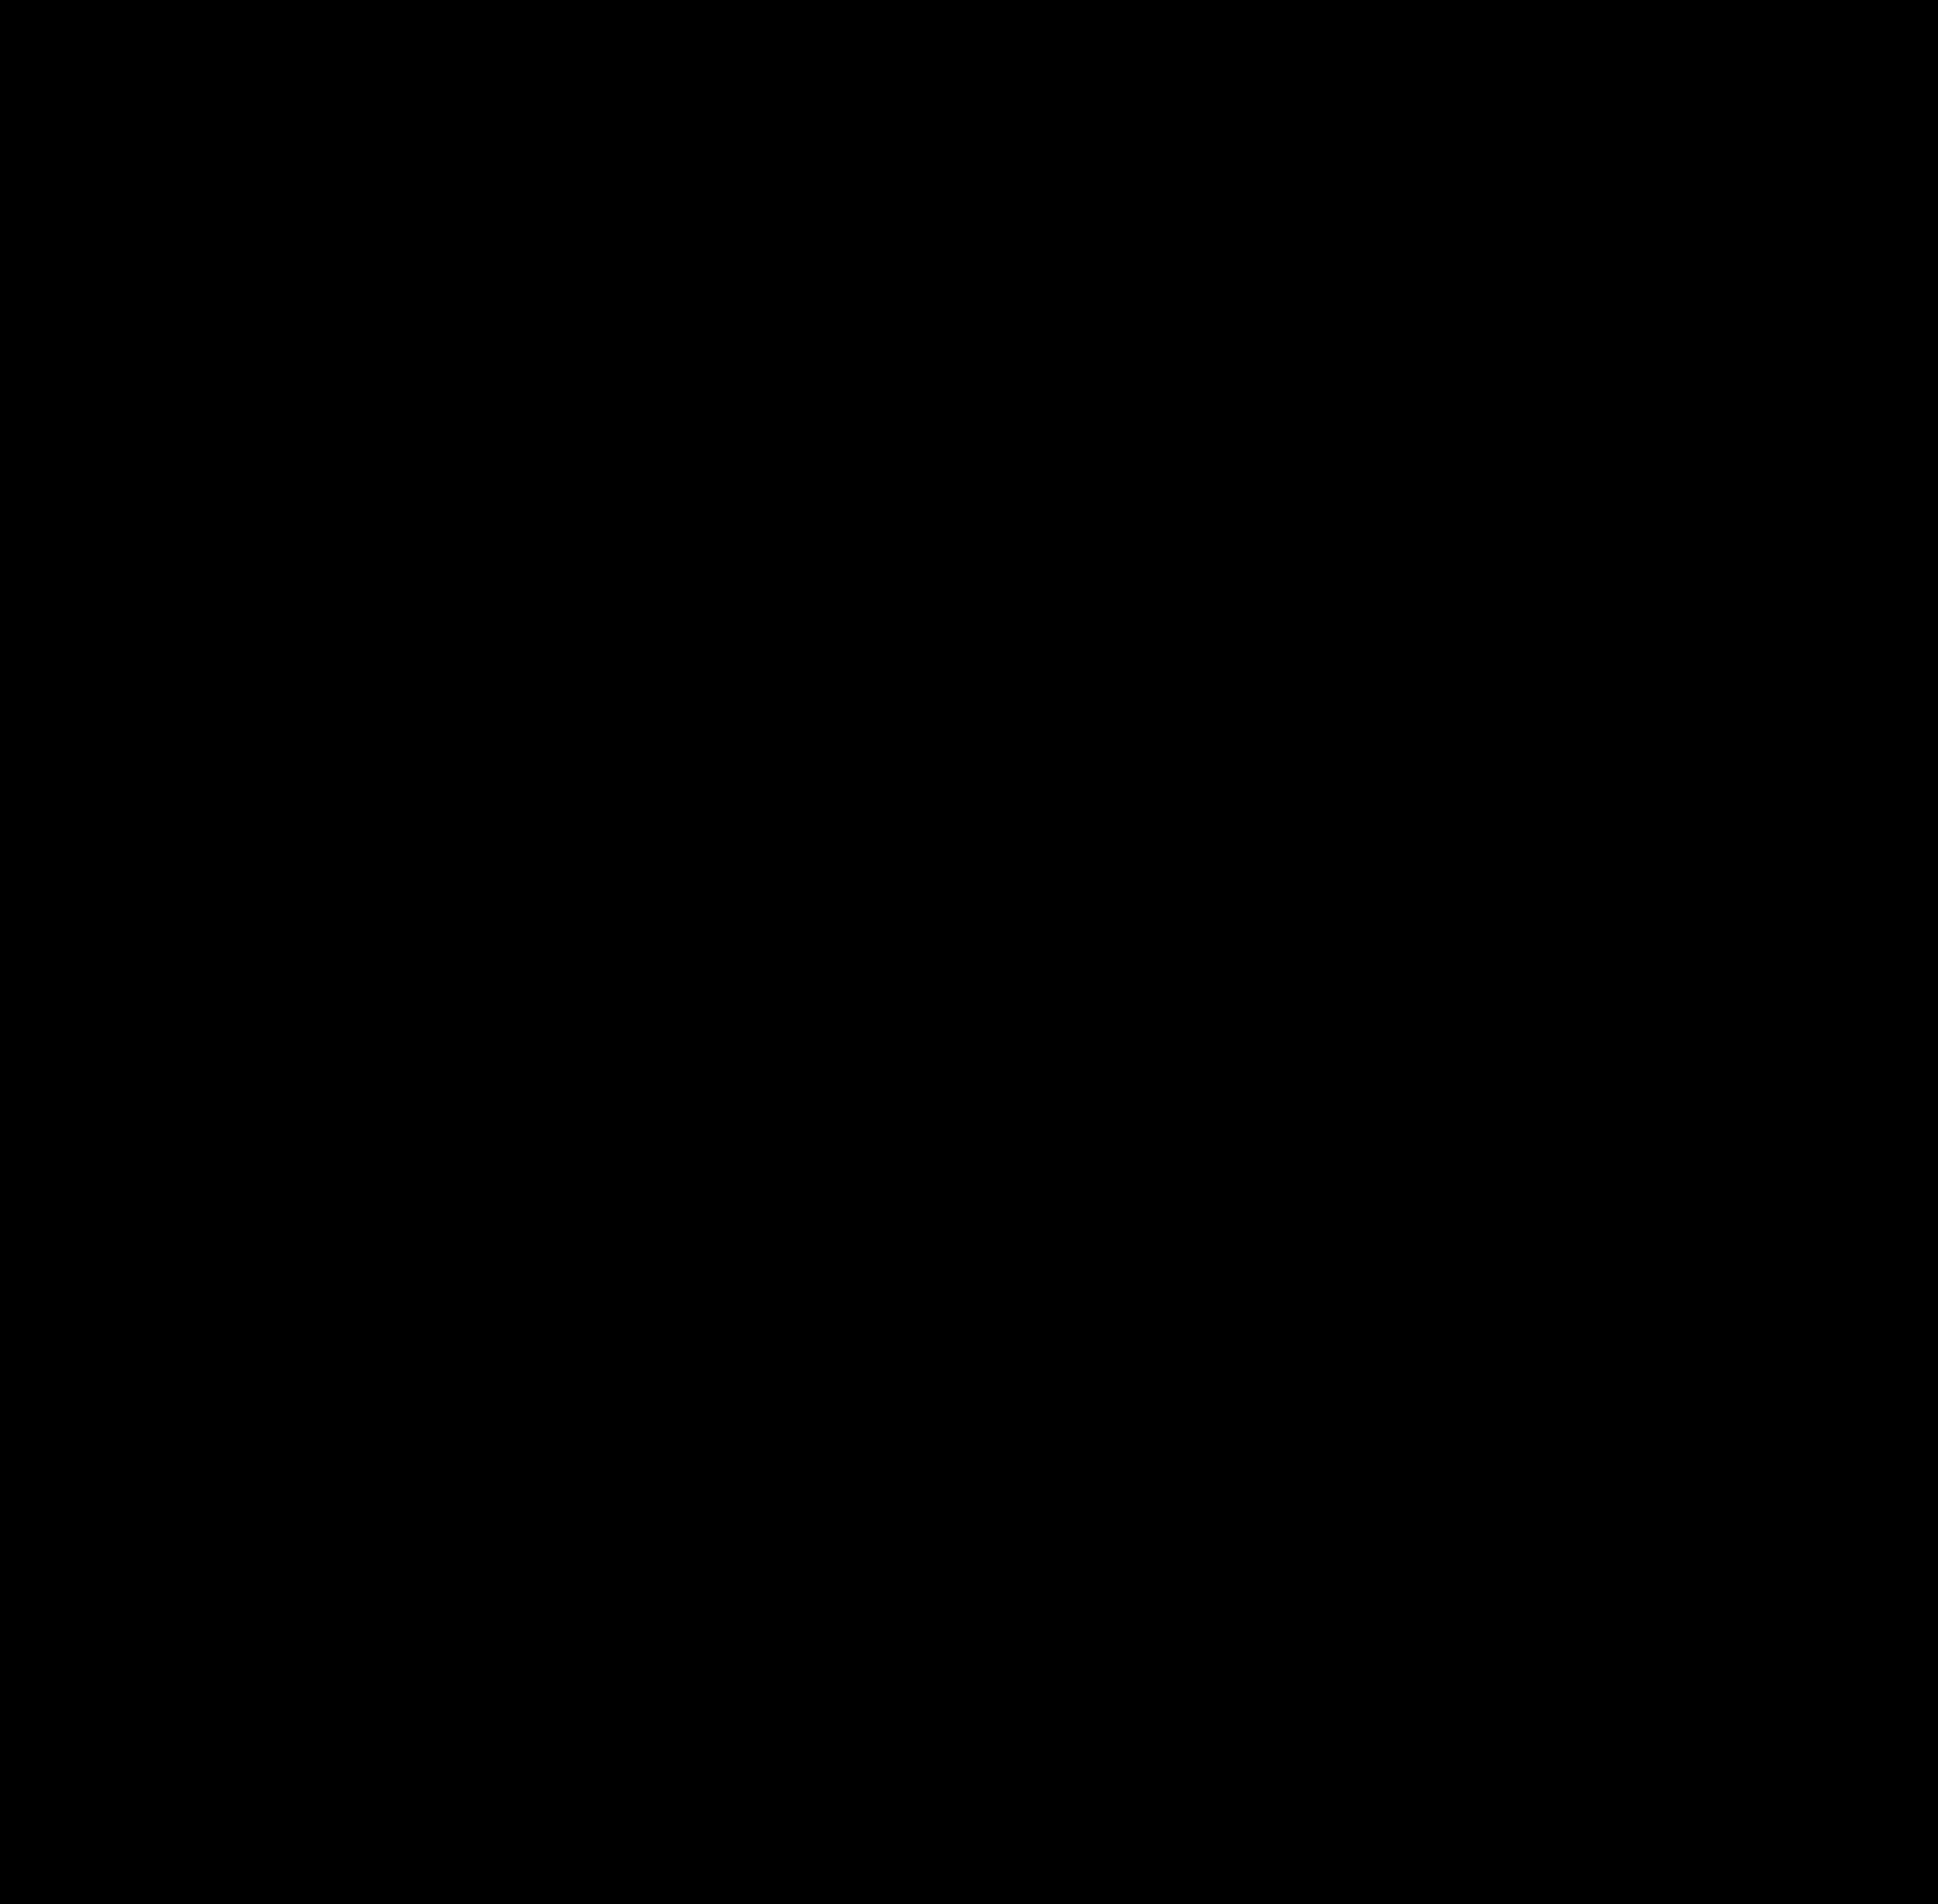 KS-logo (1).png